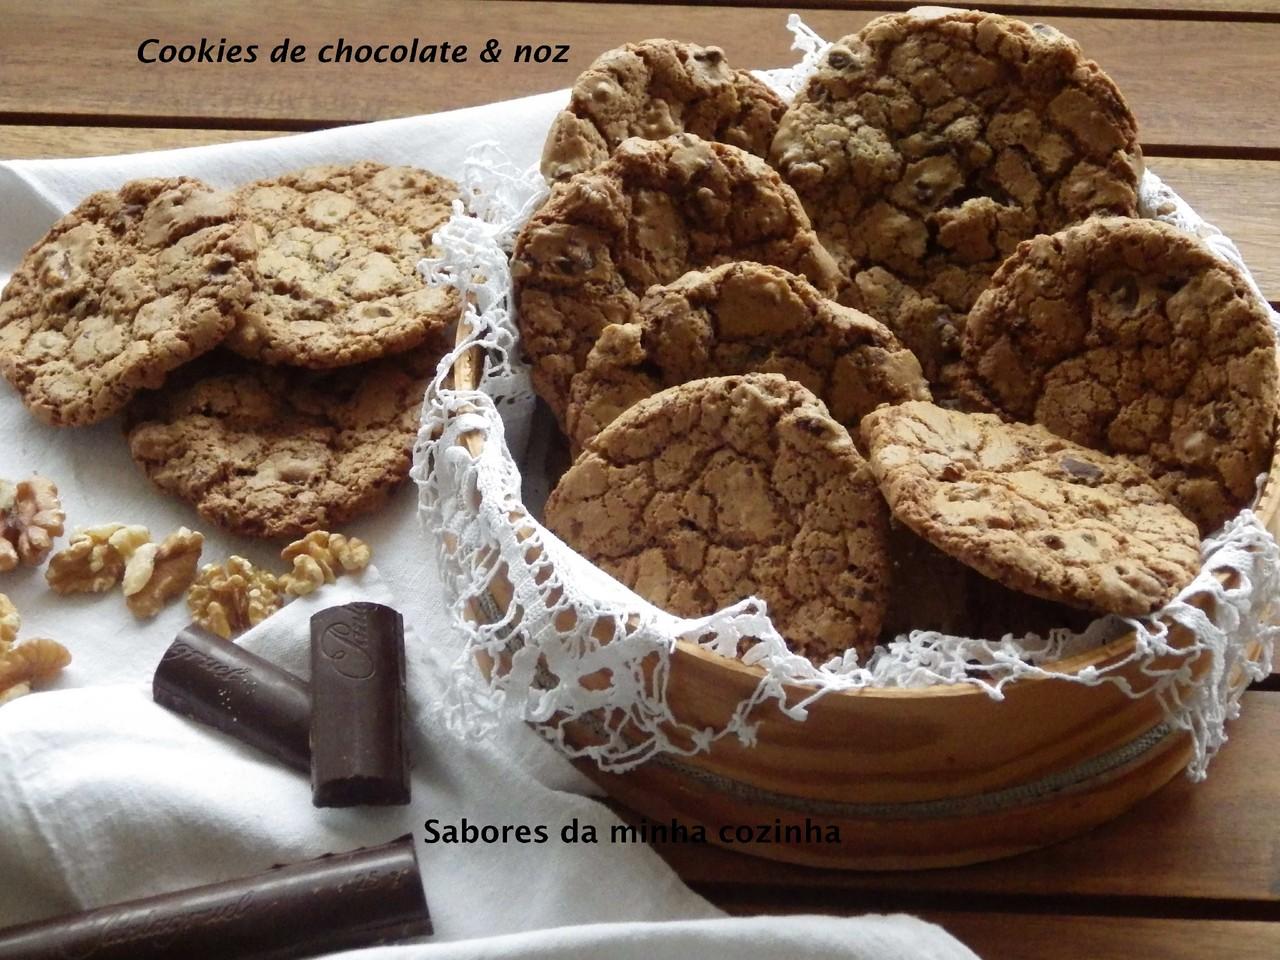 IMGP4415-Cookies de chocolate & noz-Blog.JPG